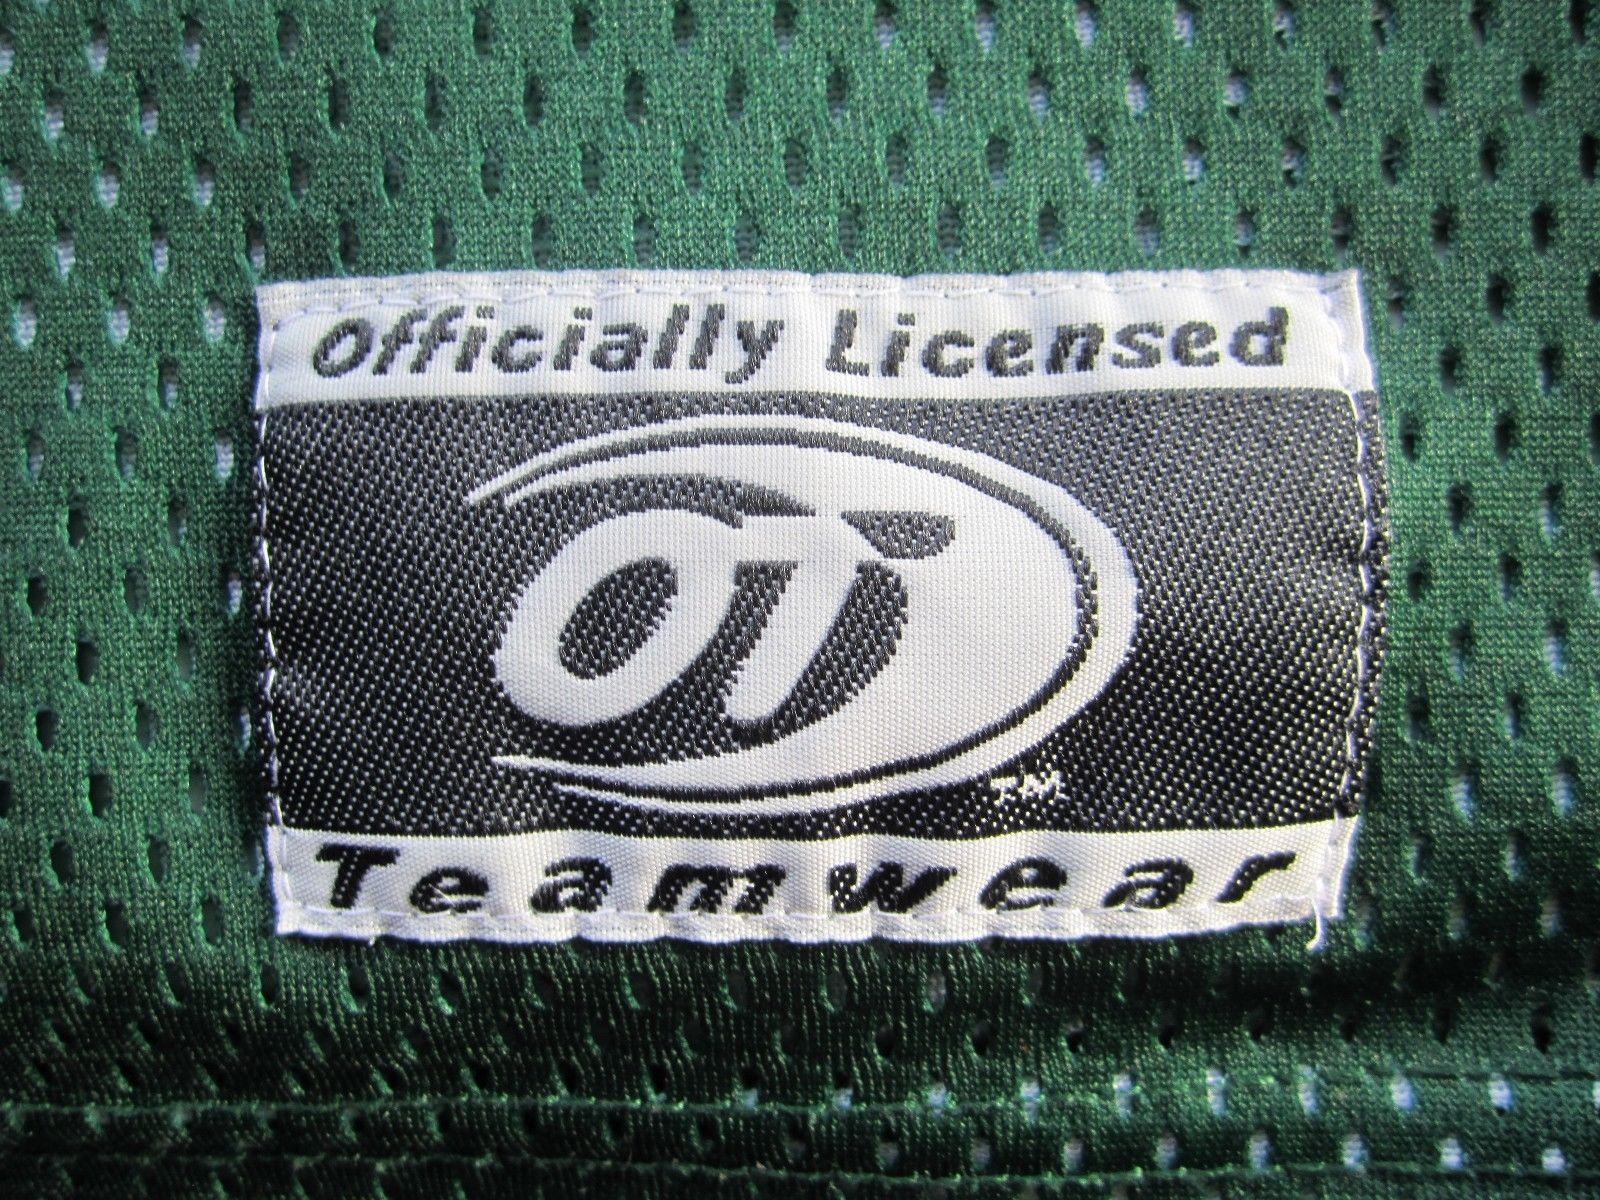 Ohio University Bobcats L OT Sports #1 Mesh Football Jersey MADE IN USA